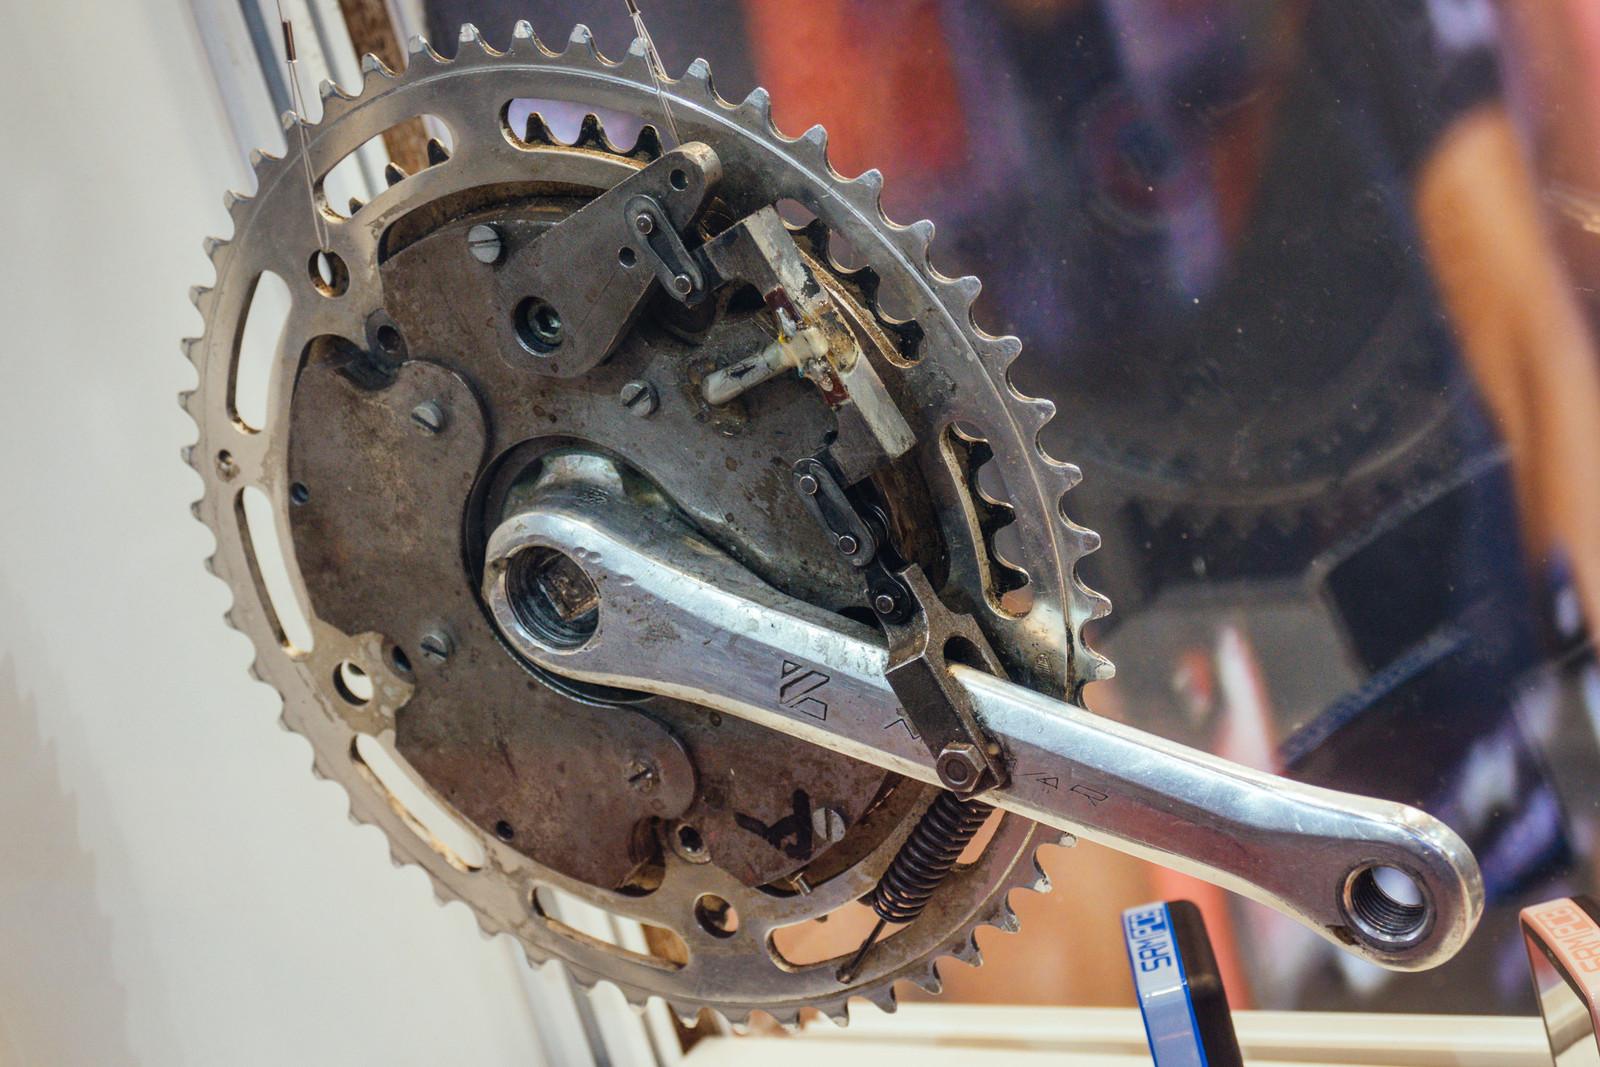 SRM Power Meter Evolution - EUROBIKE - 2017 Mountain Bike Components - Mountain Biking Pictures - Vital MTB